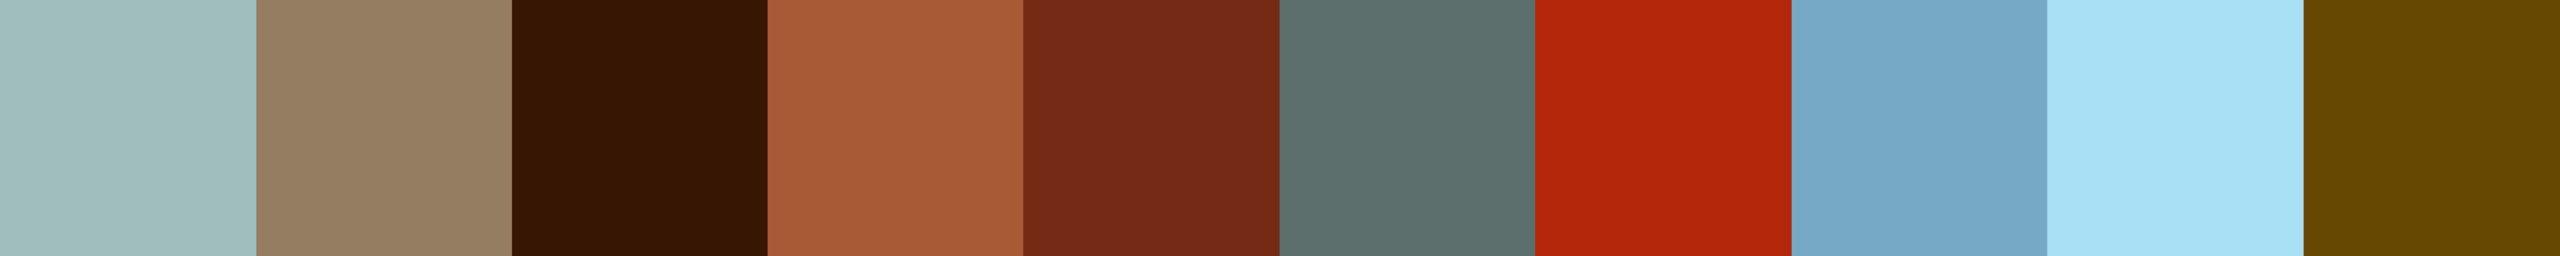 681 Detimena Color Palette